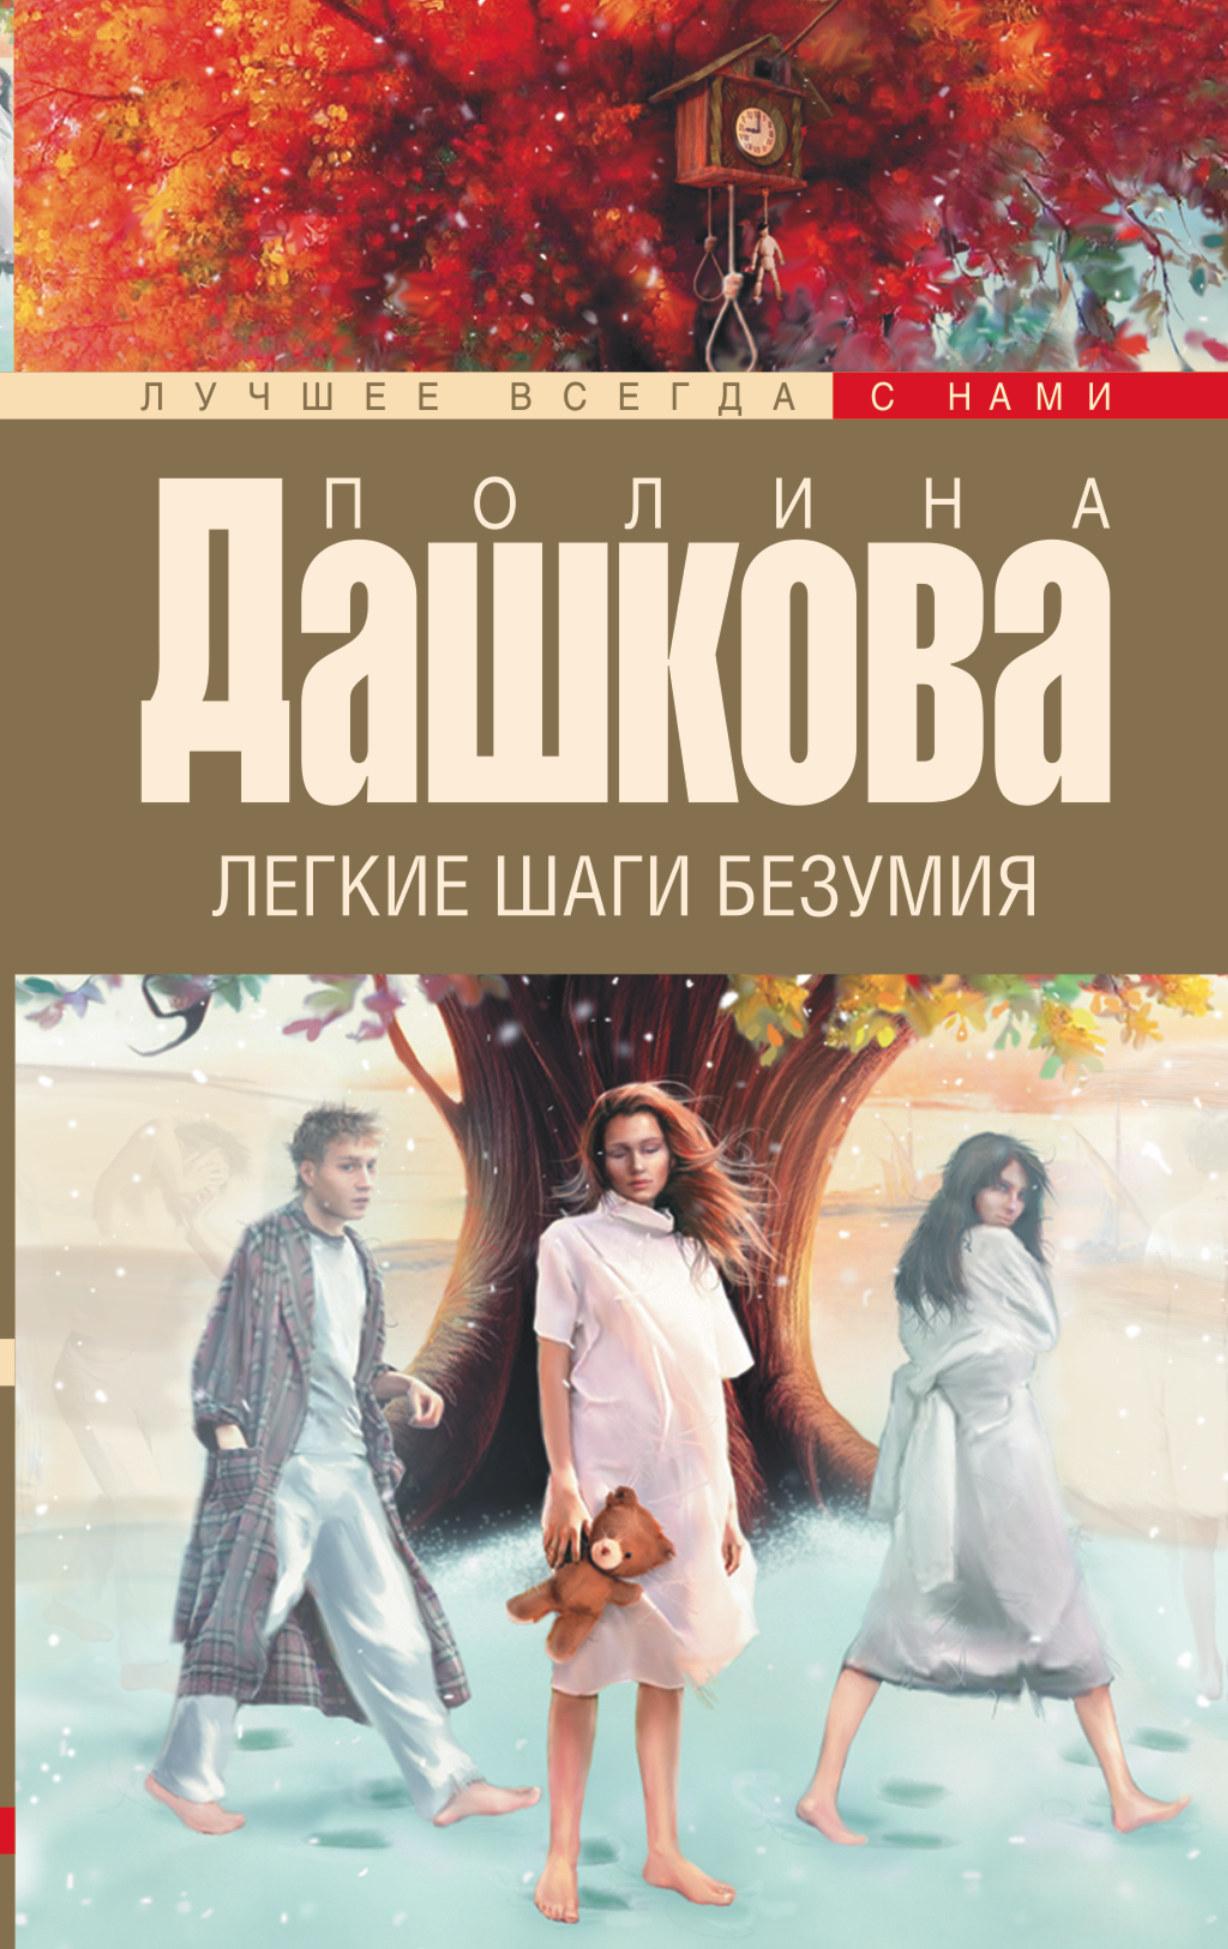 Дашкова П.В. Легкие шаги безумия